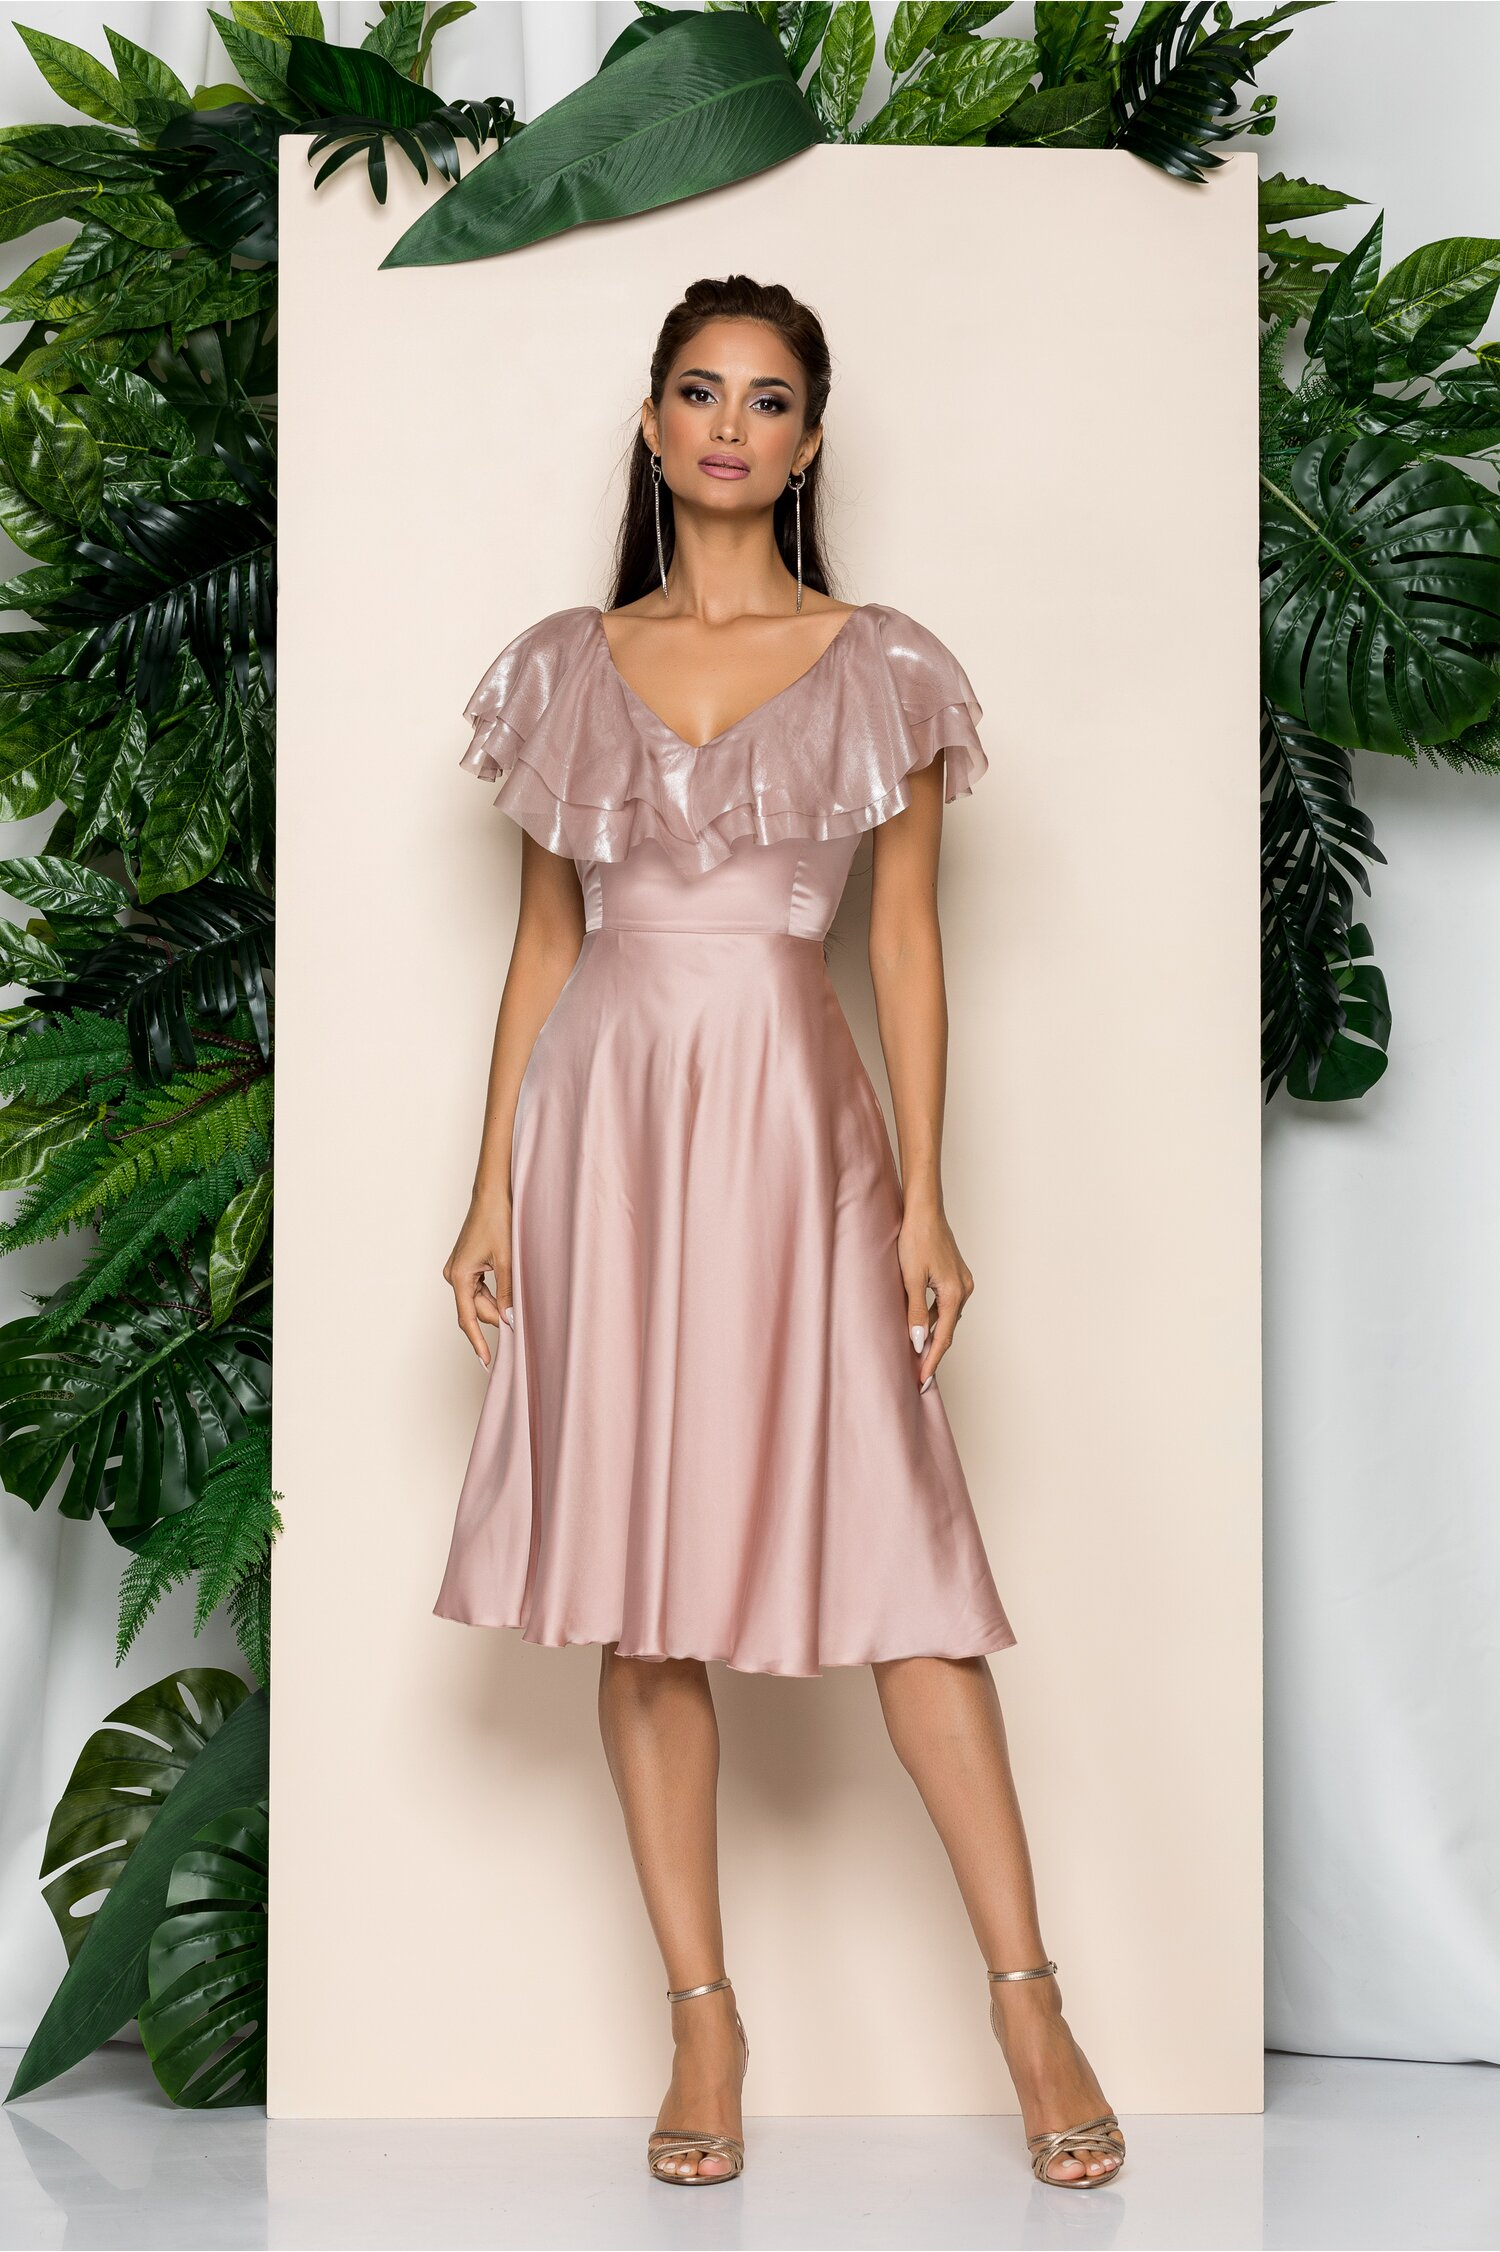 Rochie Leonard Collection roz cu volanase la bust si cordon in talie